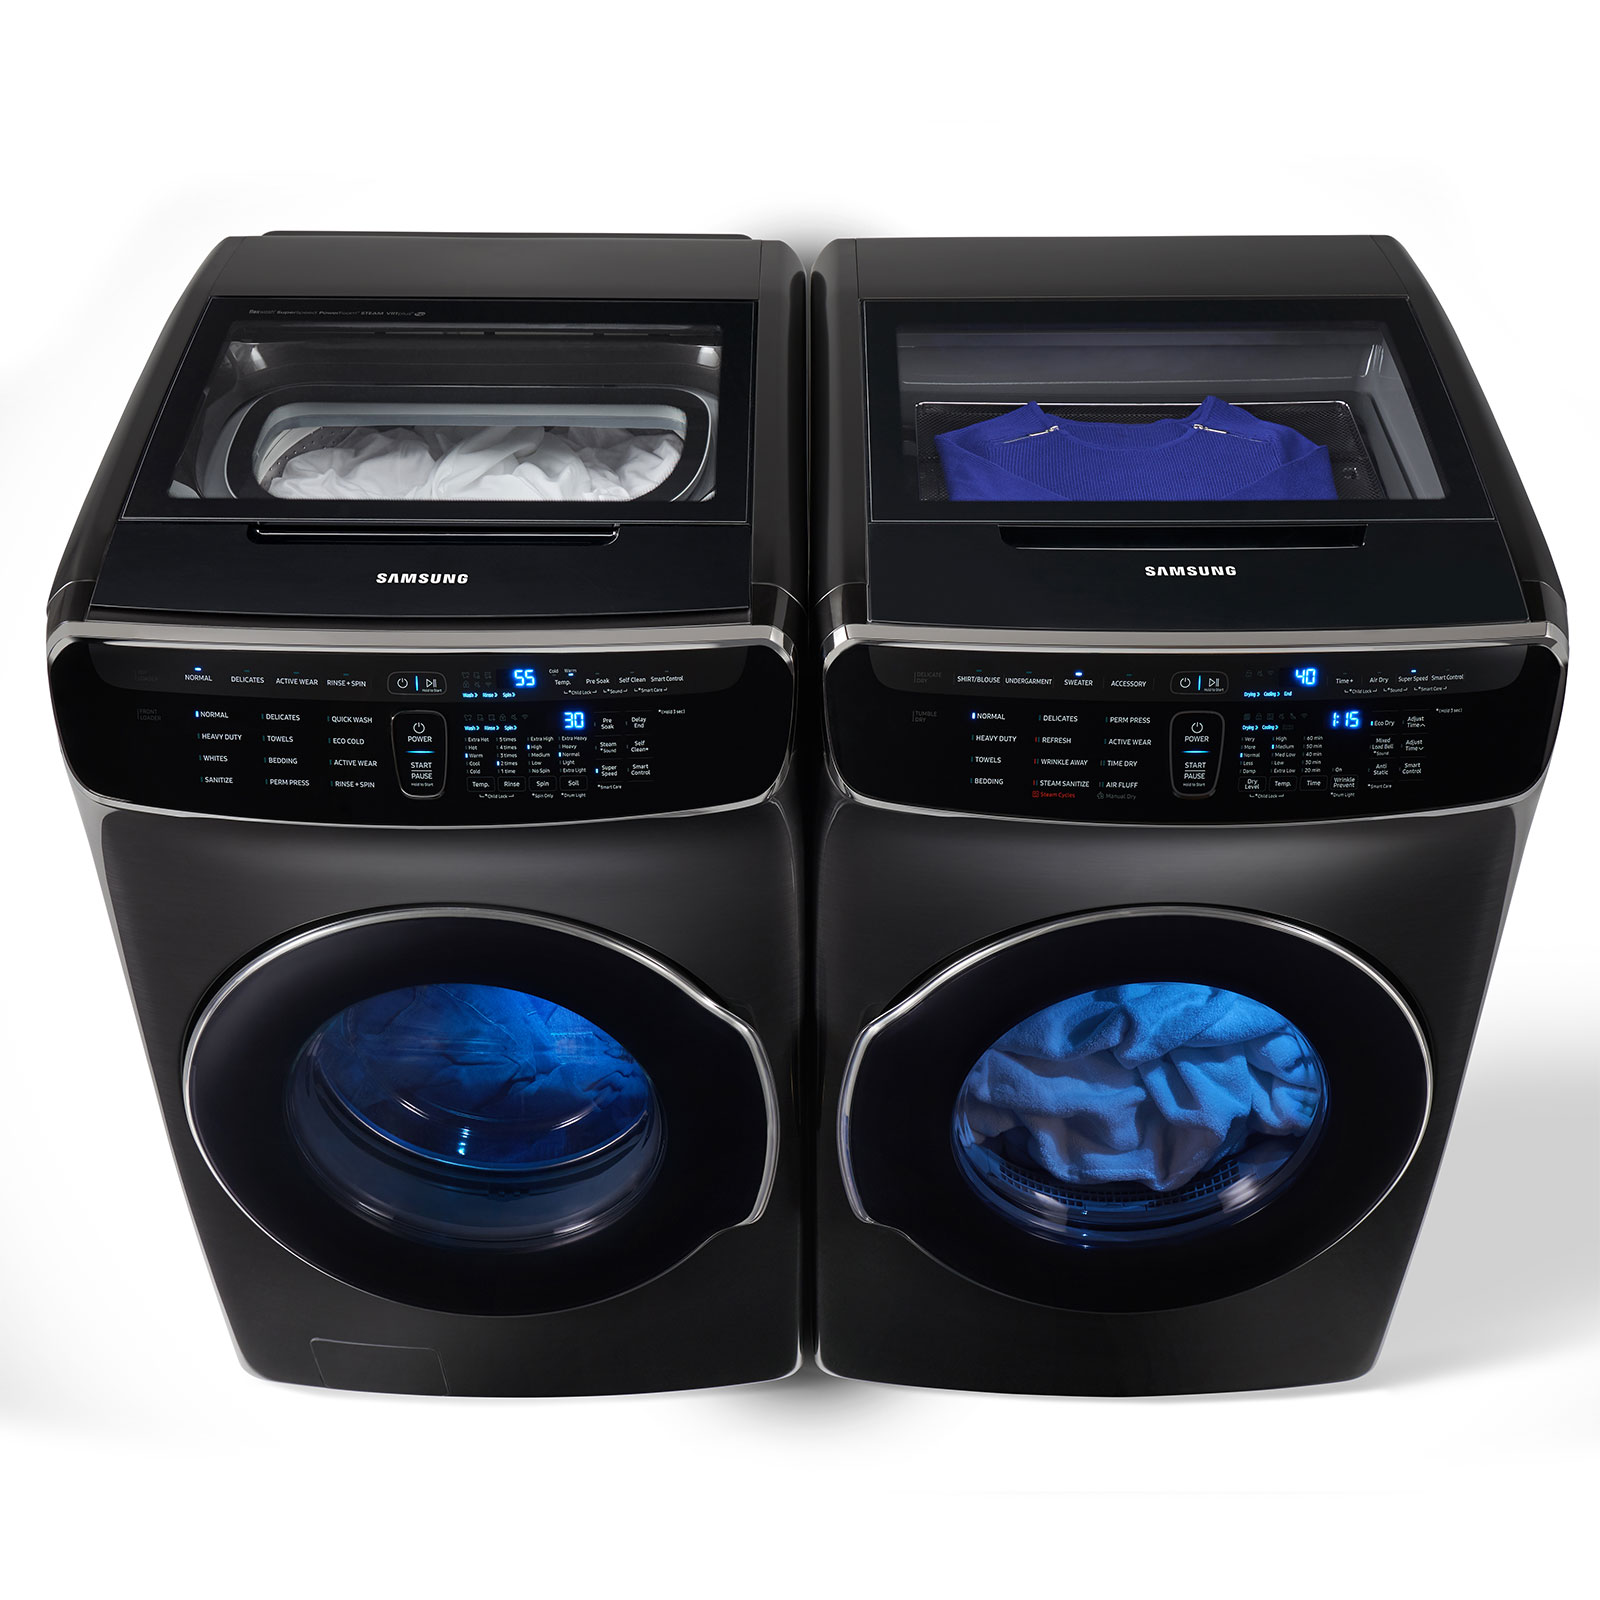 6.0 Total cu. ft. FlexWash Washer & 7.5 cu. ft. FlexDry Electric/gas Dryer - Black Stainless Steel